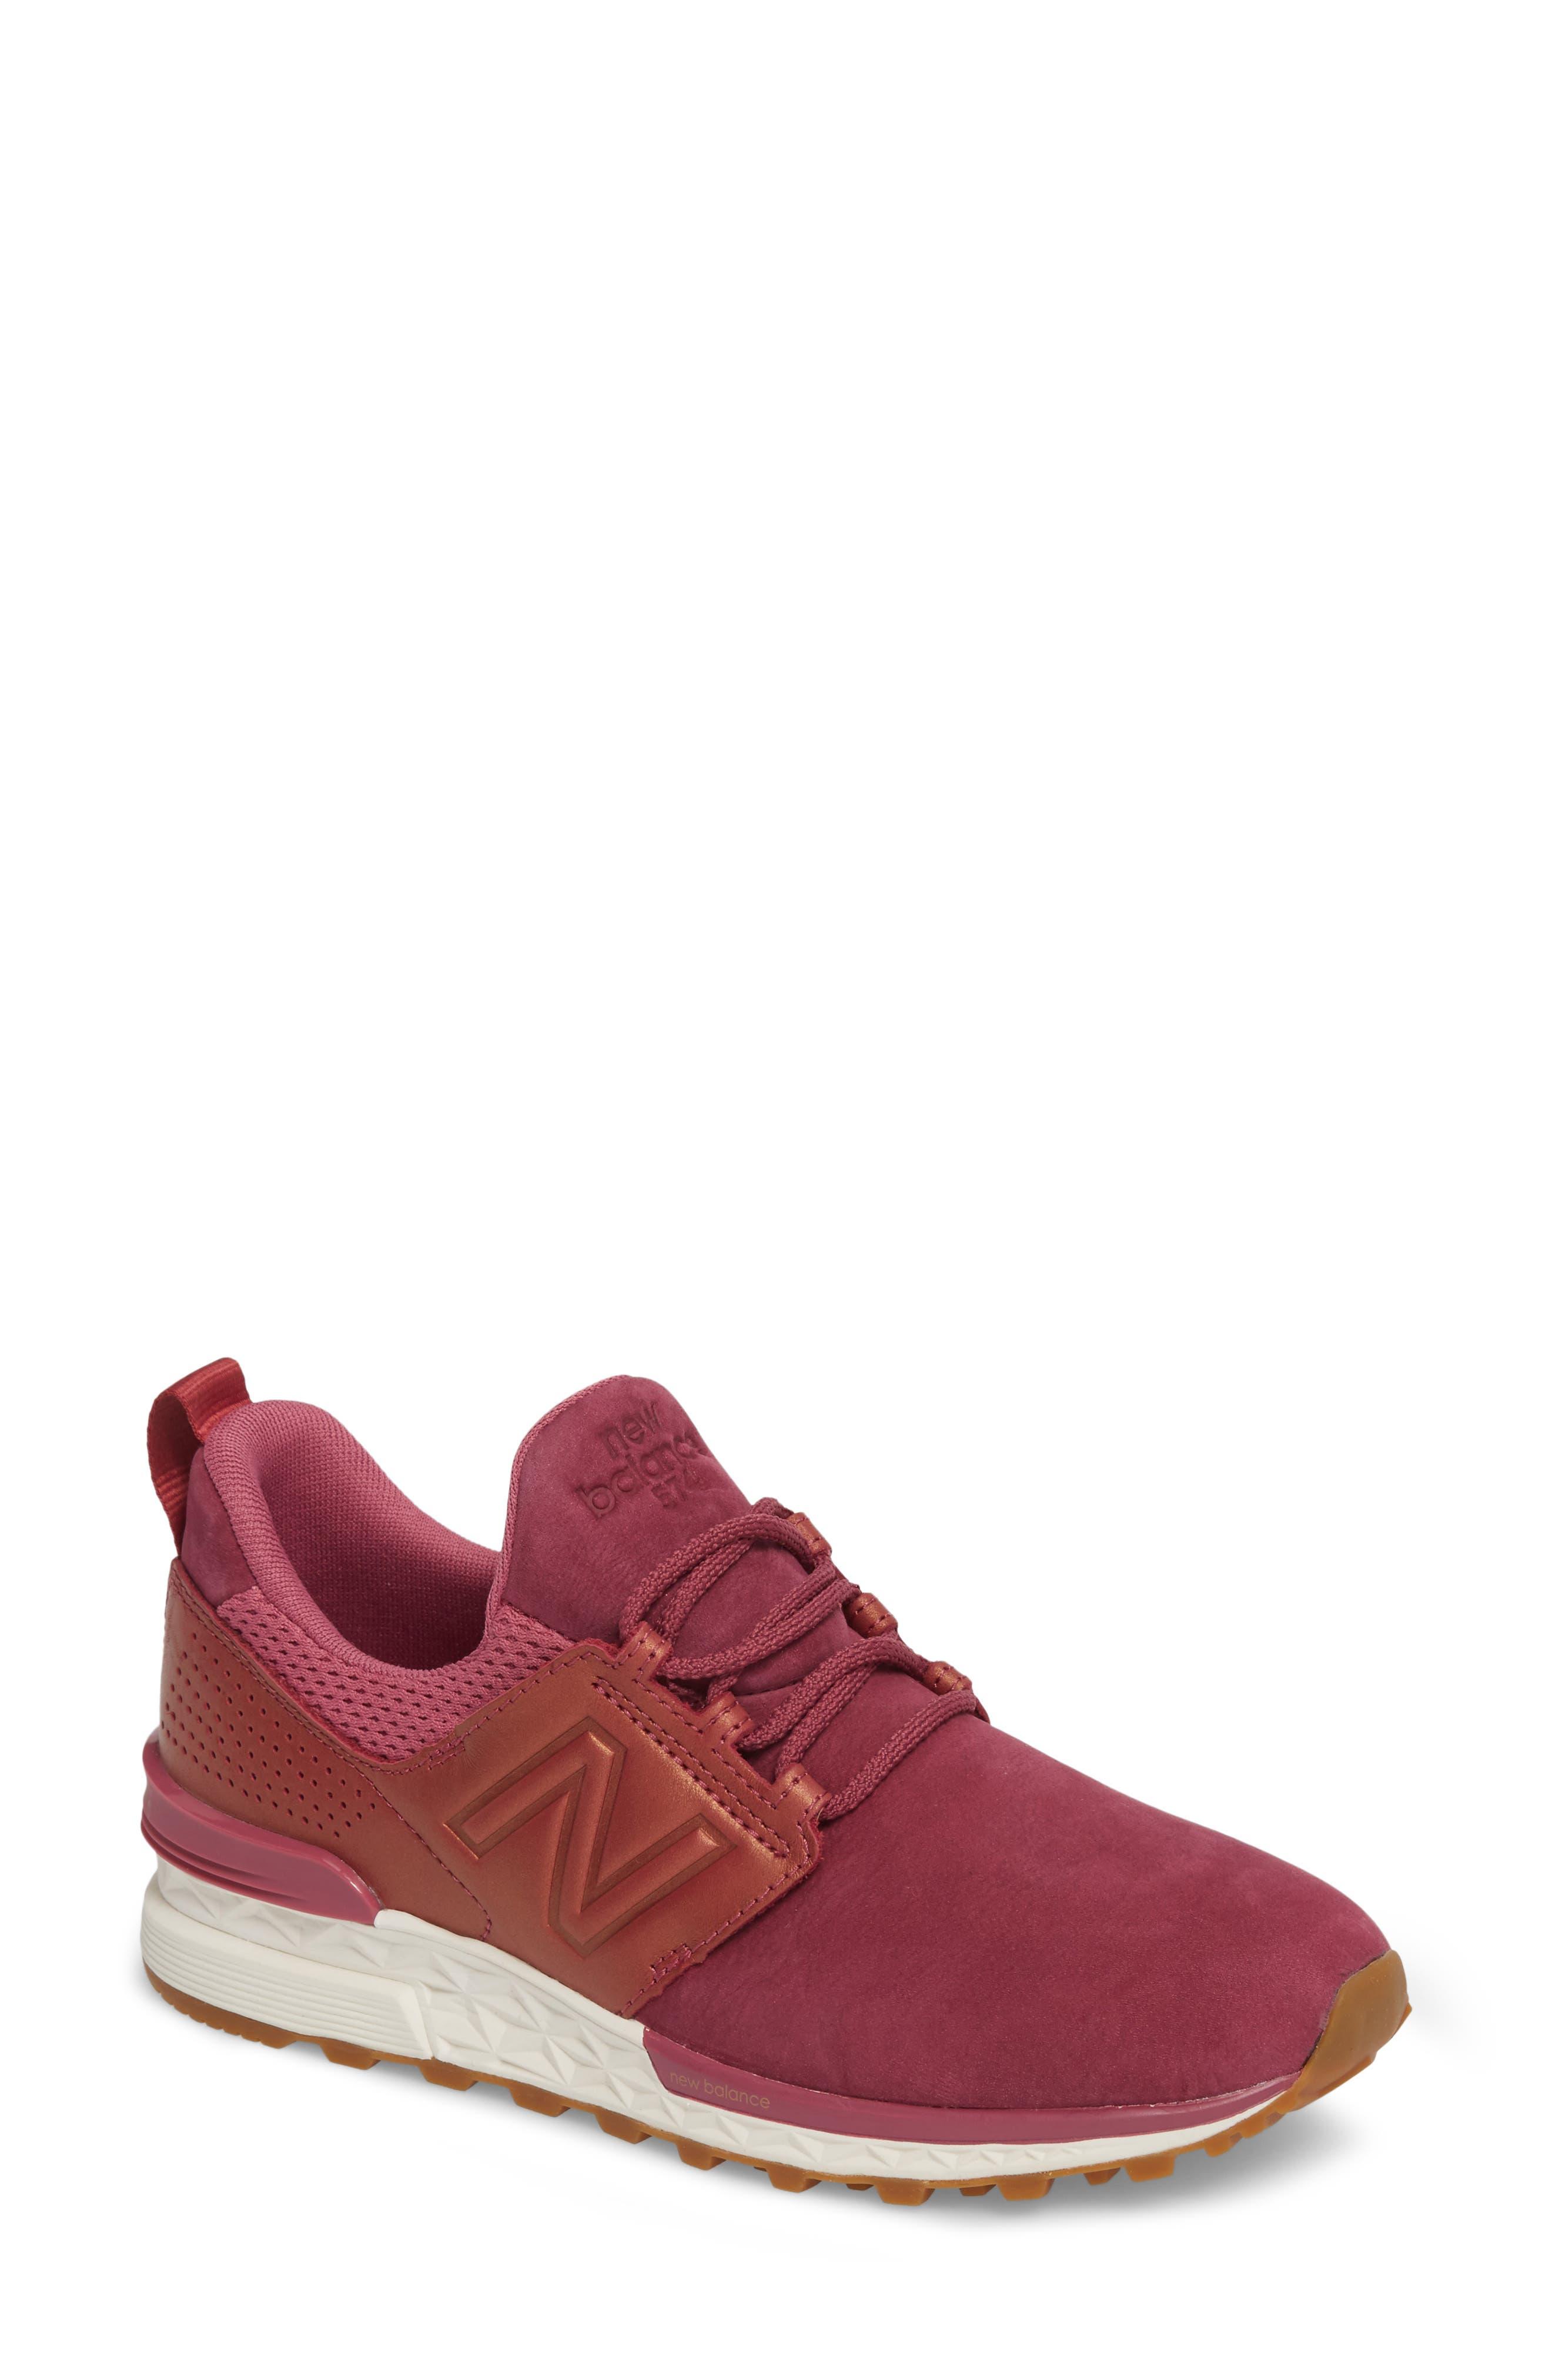 Nubuck 574 Sport Sneaker,                             Main thumbnail 1, color,                             Dragon Fruit